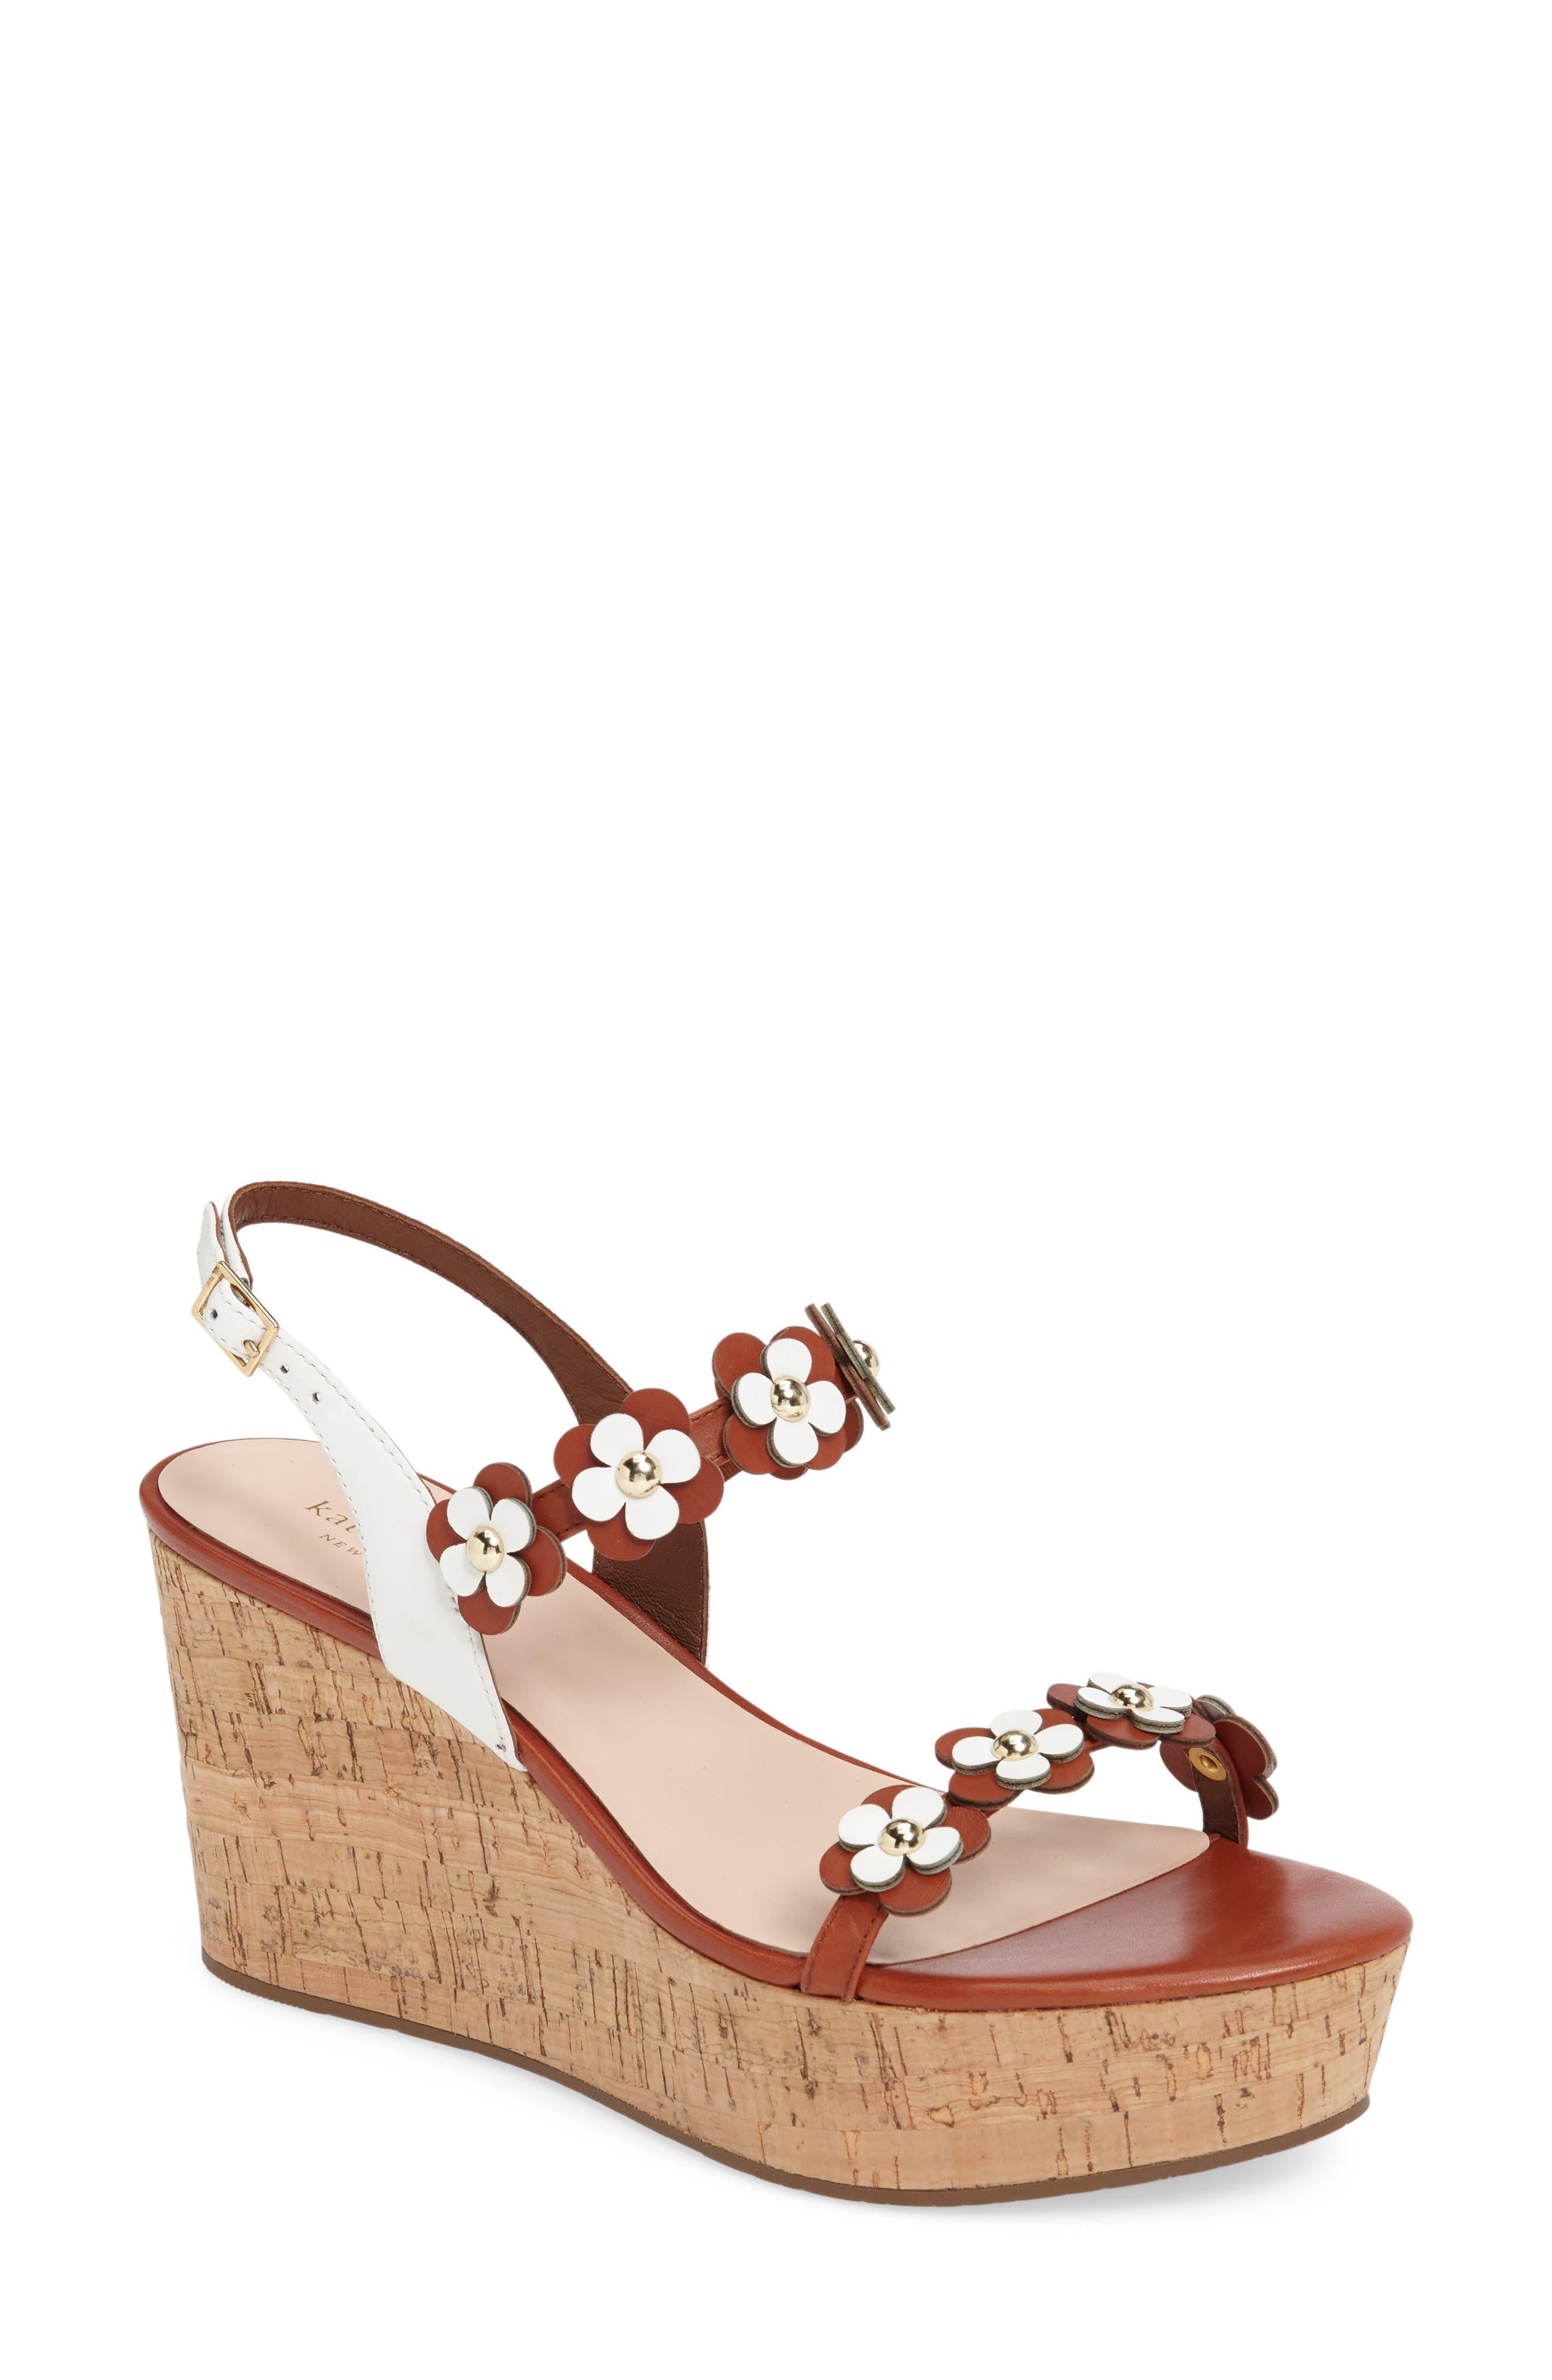 kate spade new york tisdale platform wedge sandal (Women)